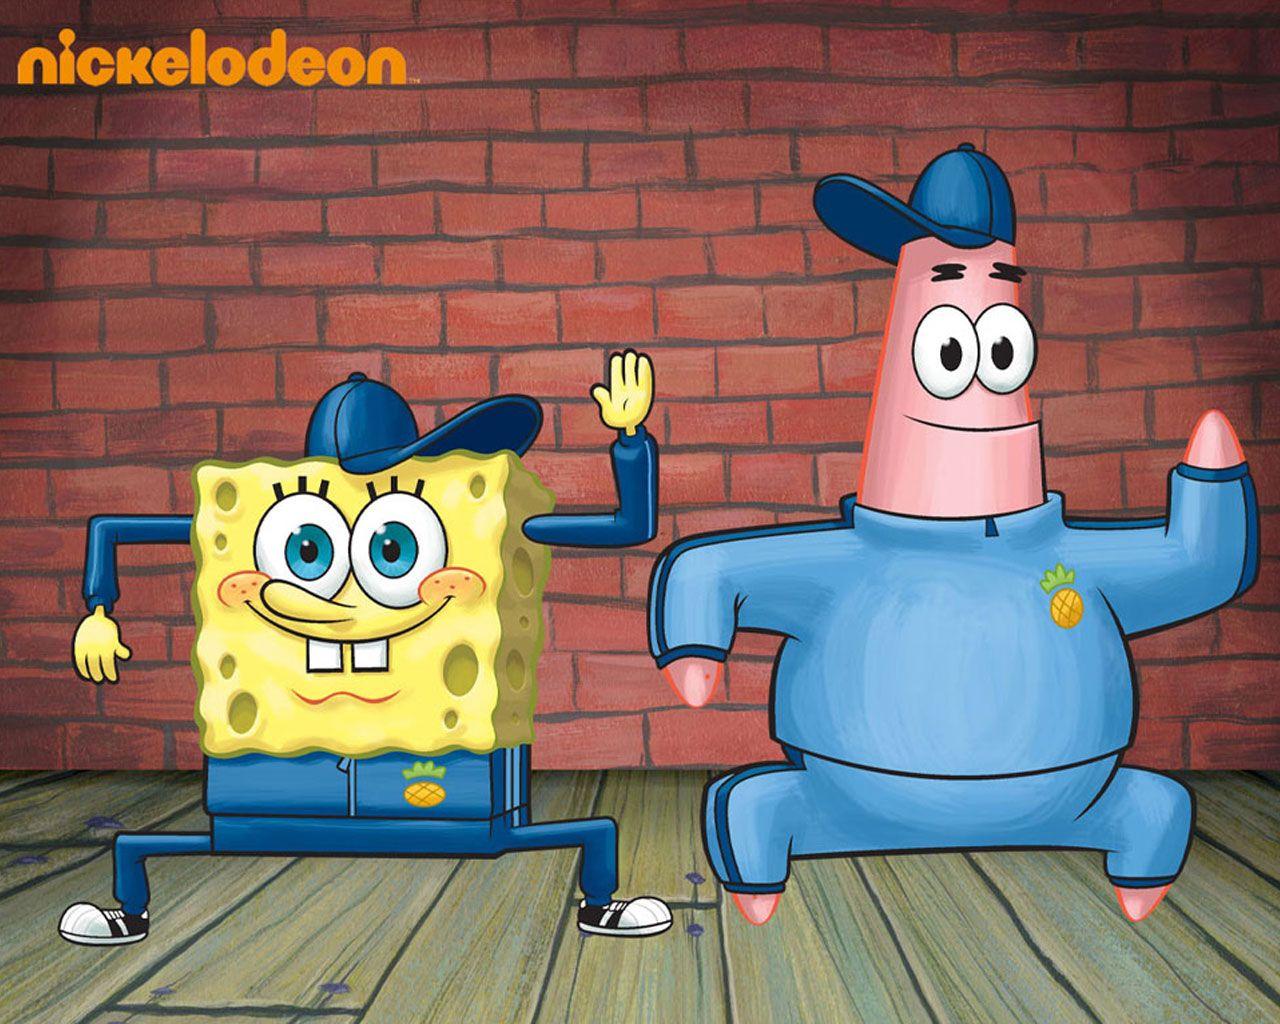 Unduh 6500 Koleksi Gambar Spongebob Lucu Dan Gokil Paling Lucu